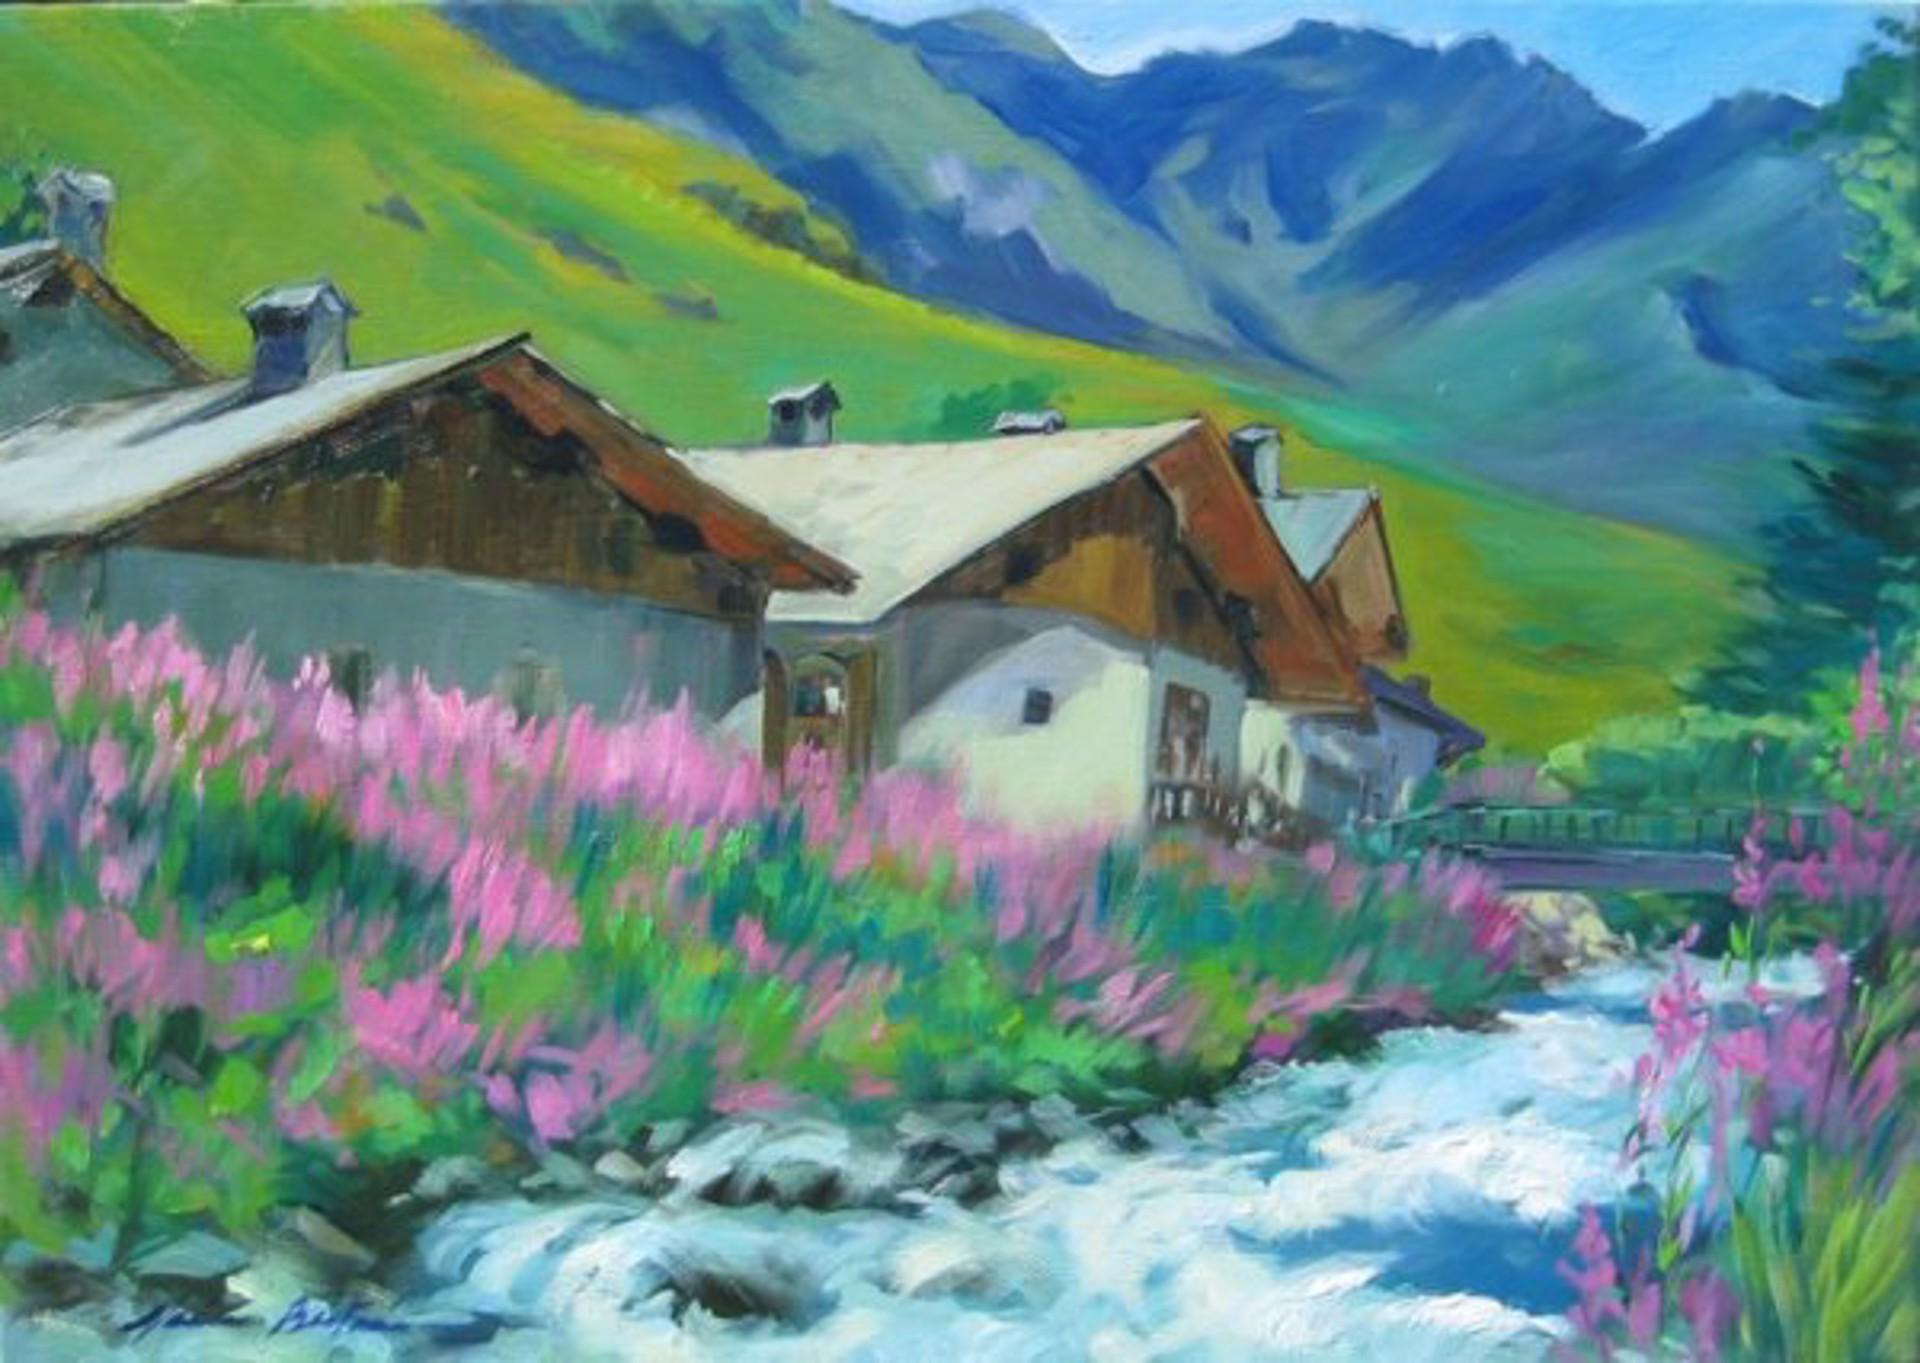 Bertran: River By Alpine Chalets by Maria Bertrán